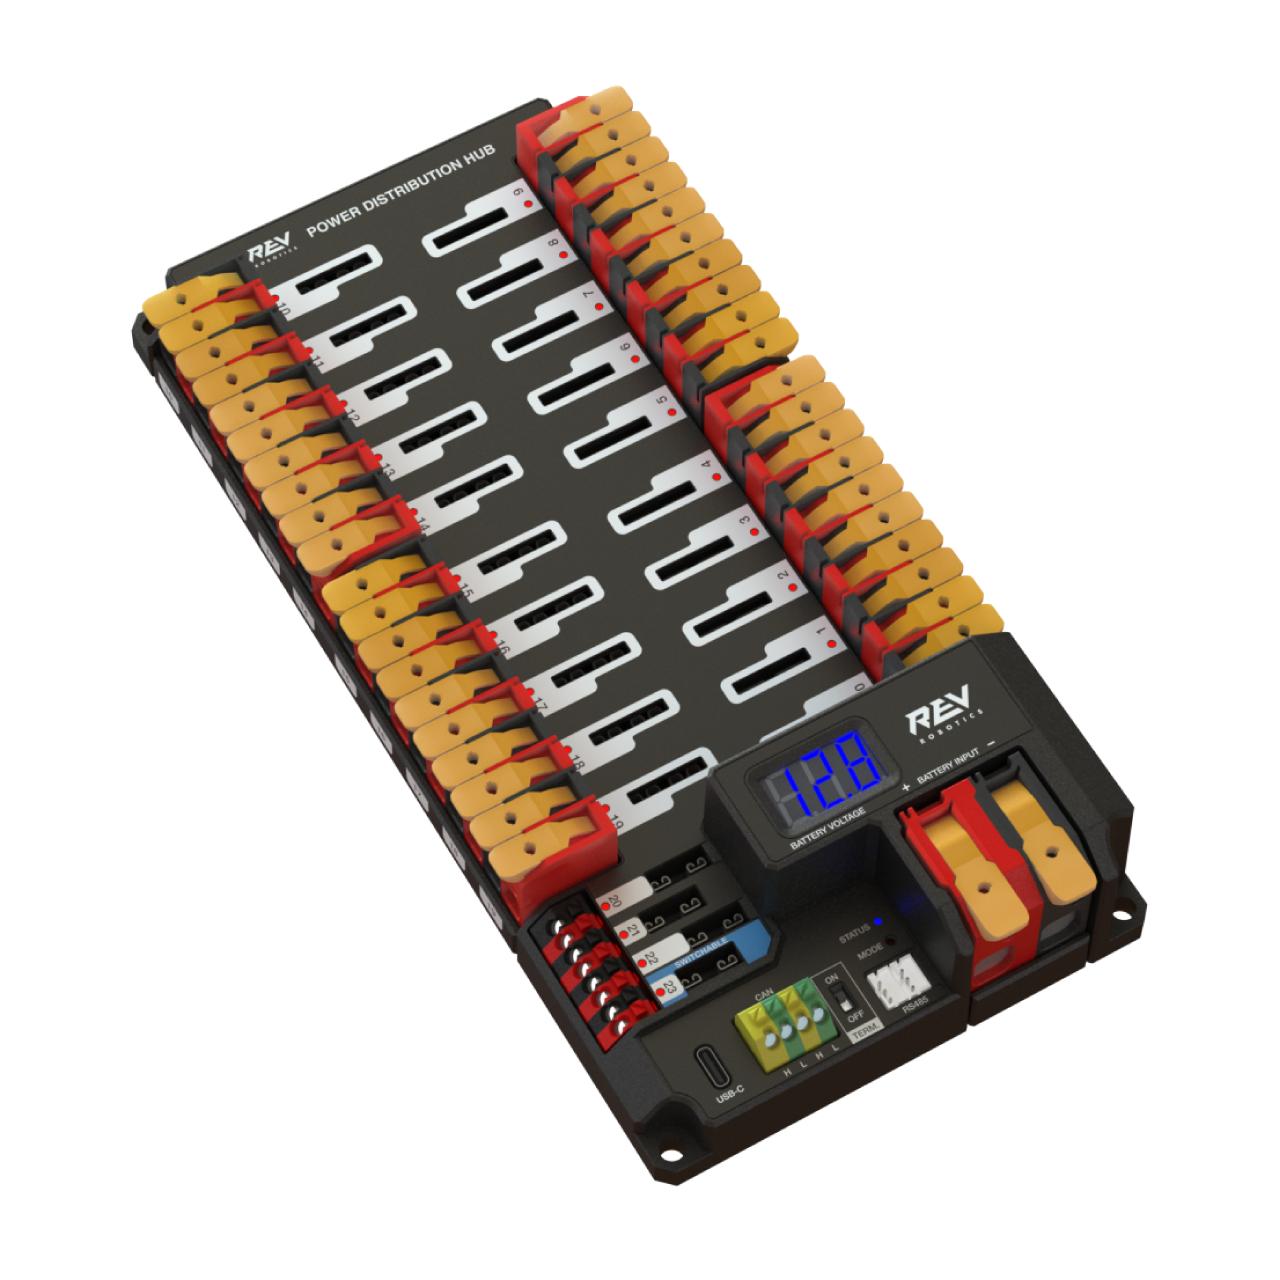 rev-11-1850-power-distribution-hub-iso-render-final-r2.png